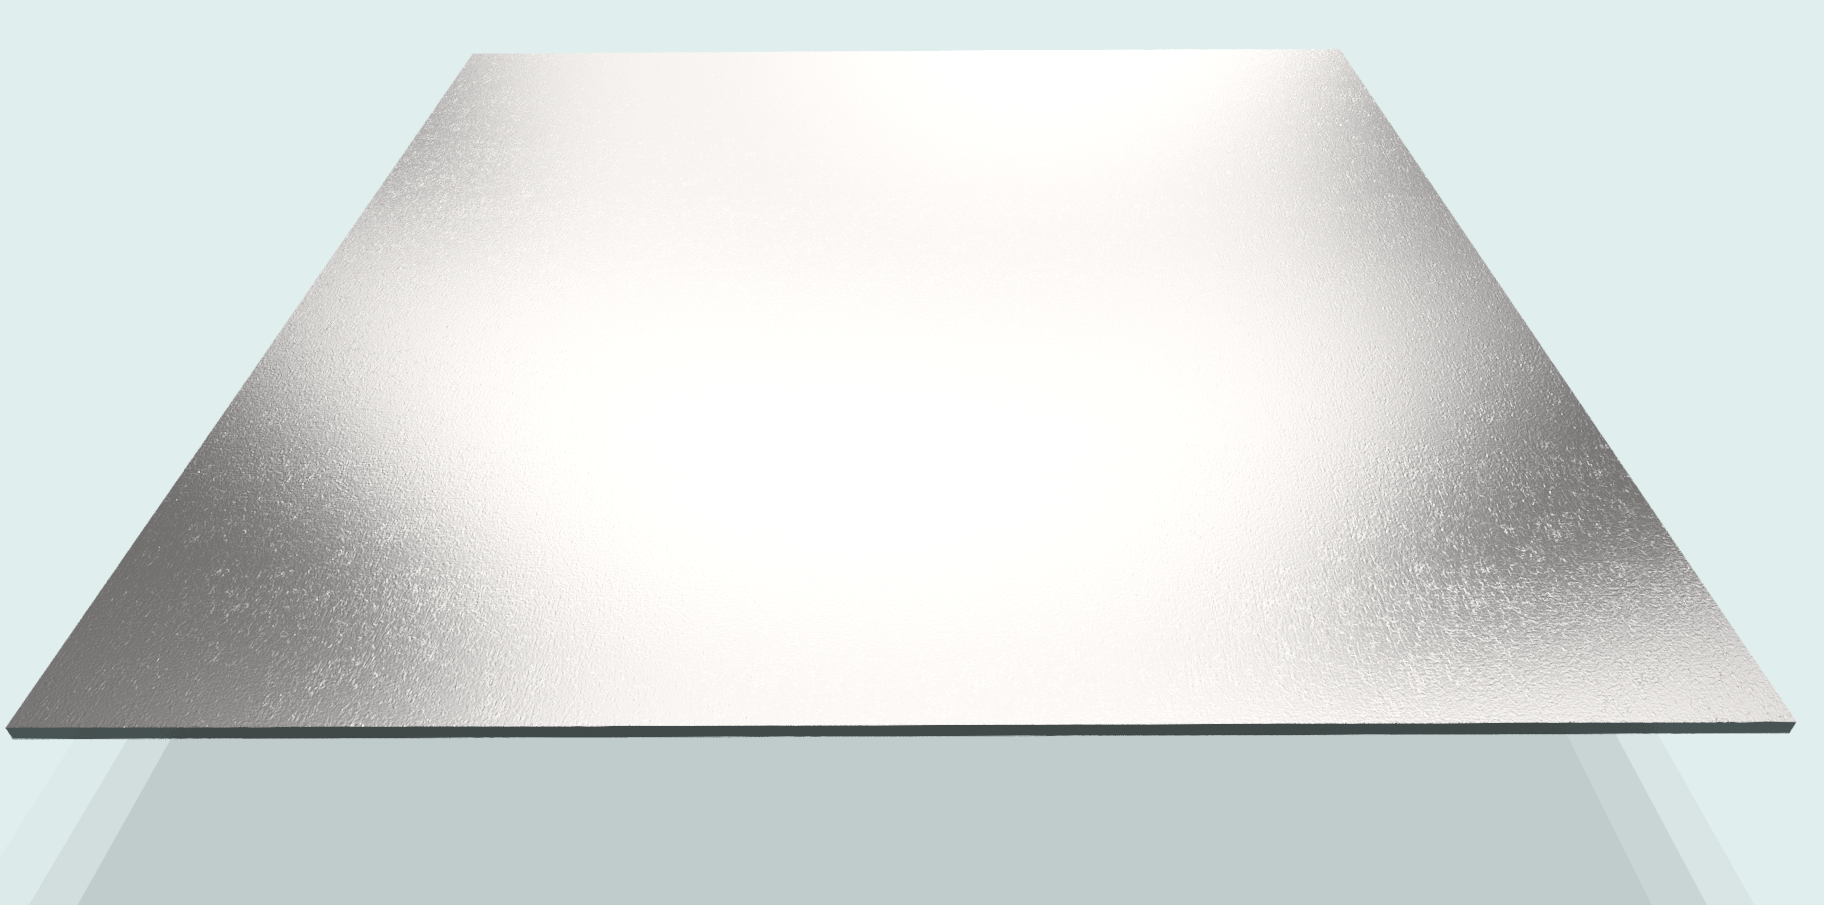 Blech 2 mm St, blank S235JR gebeizt+gefettet